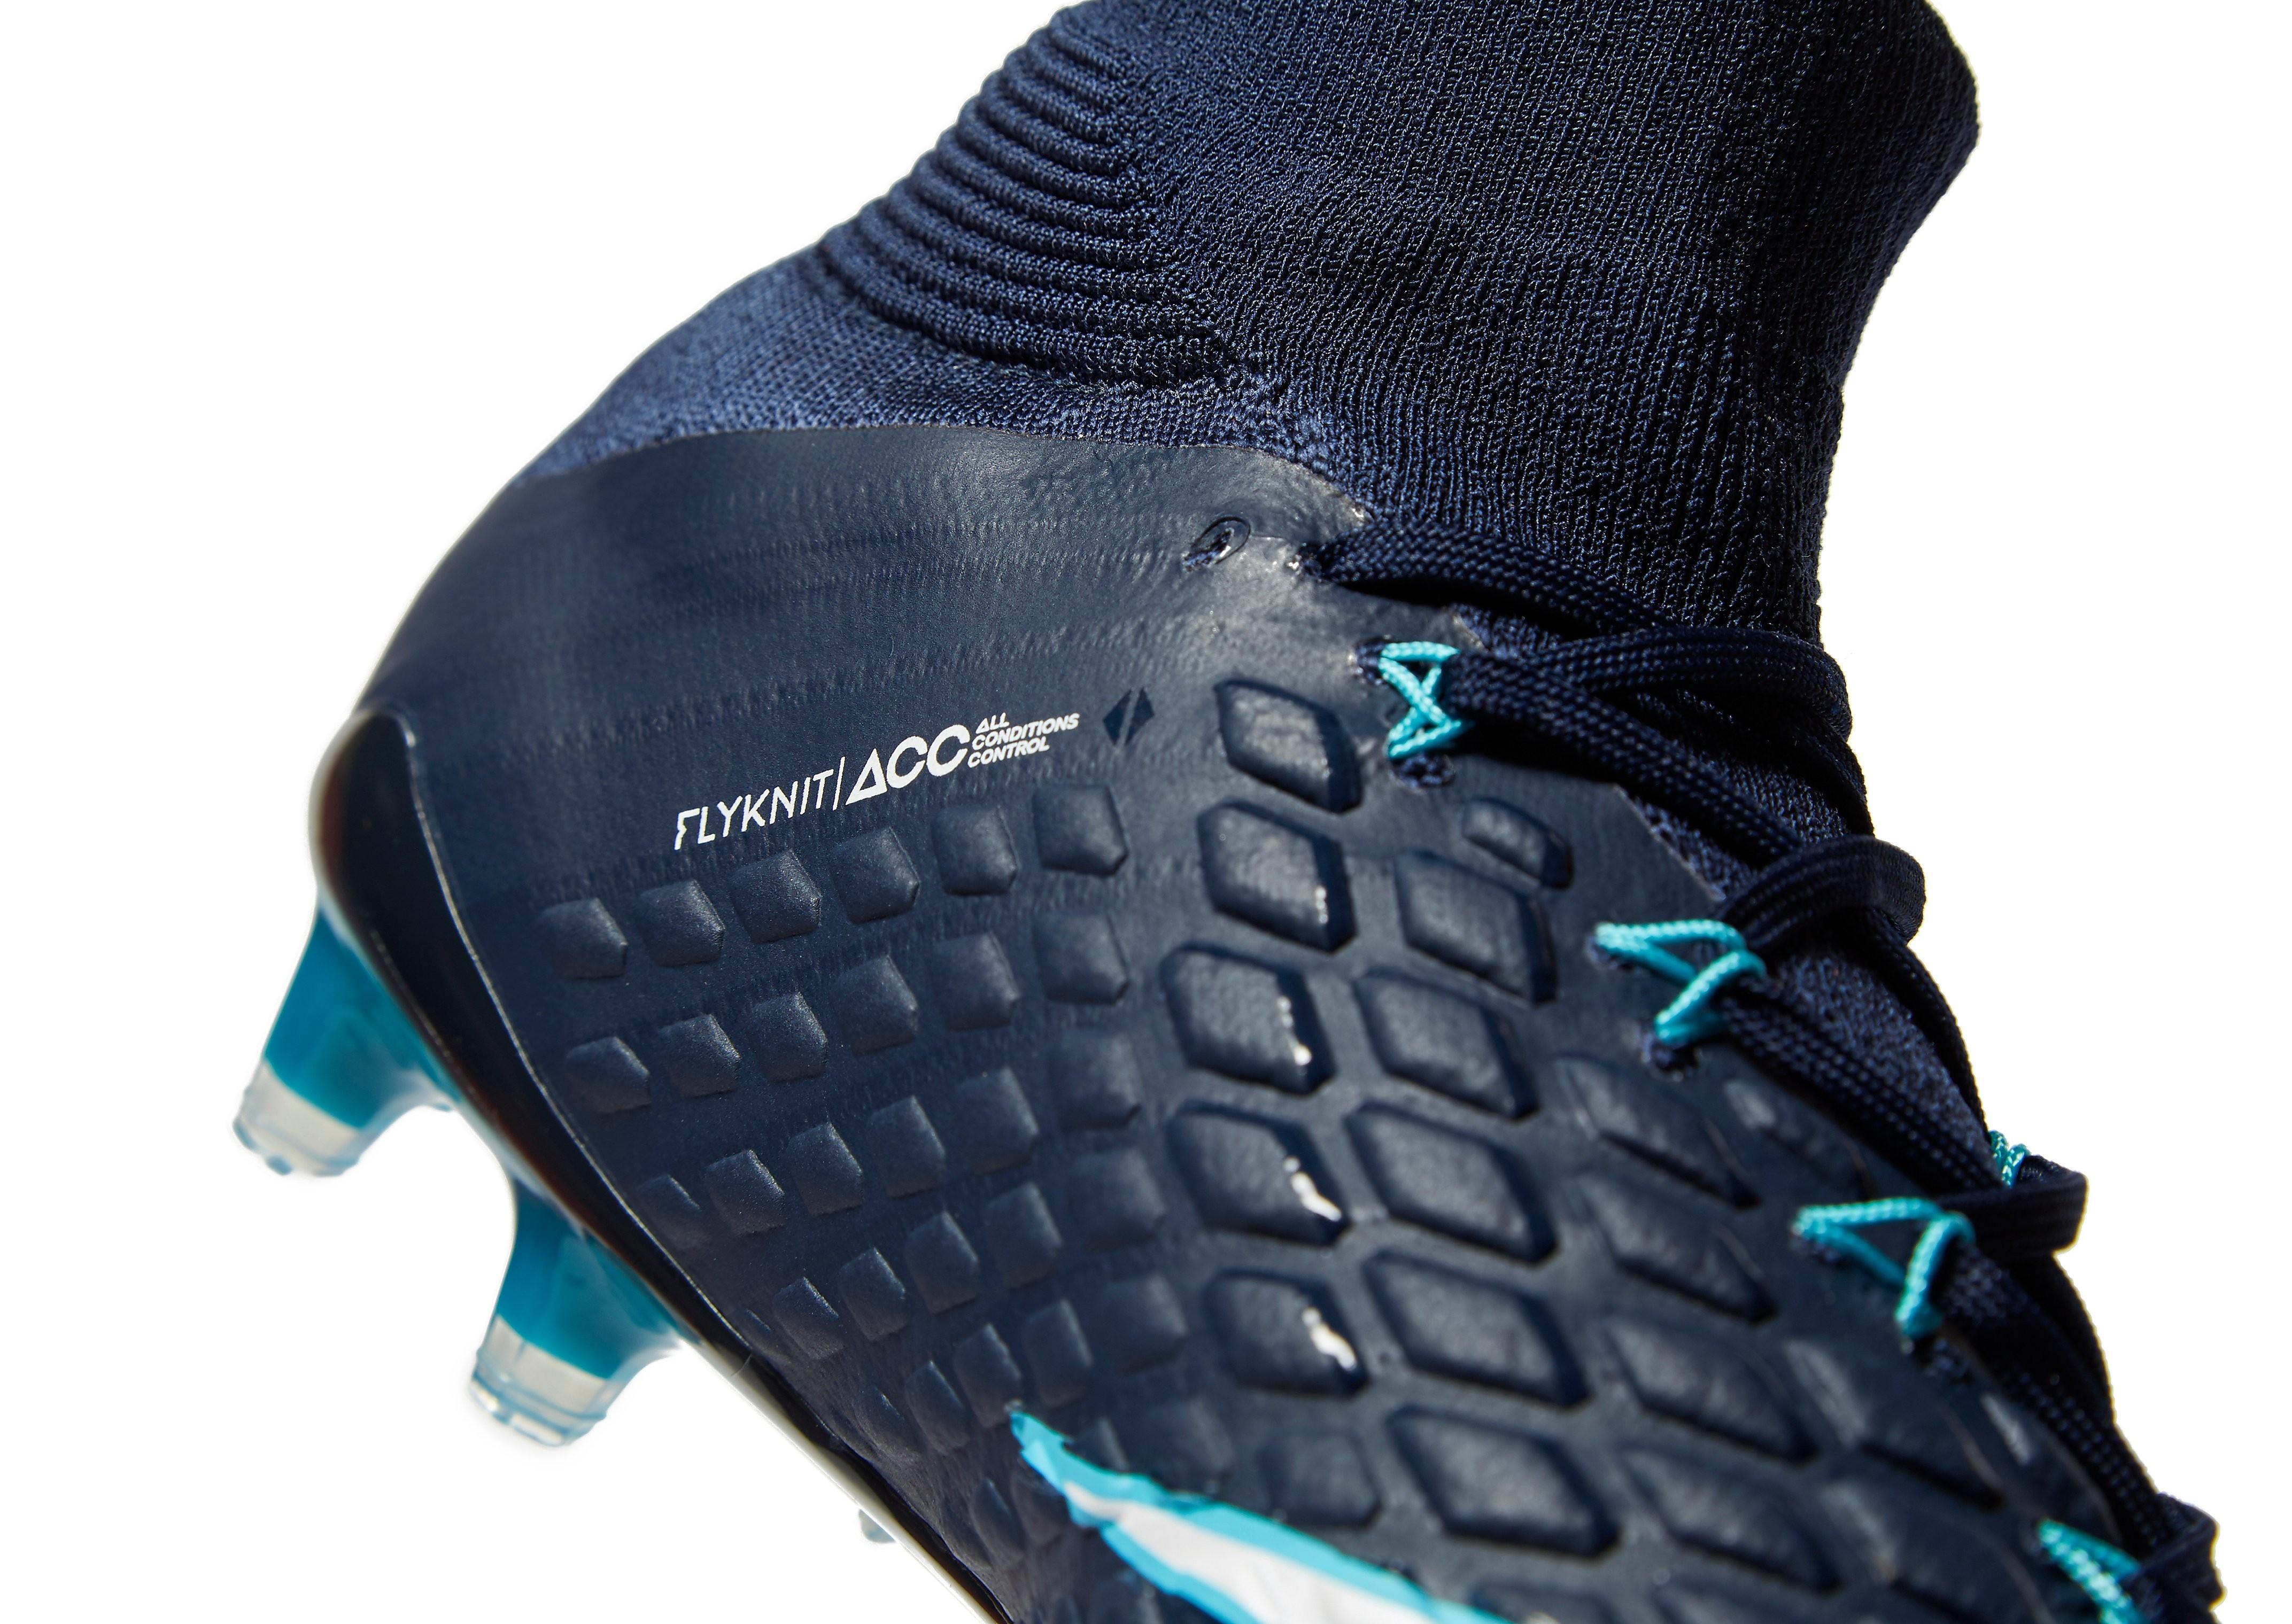 Nike Fire and Ice Hypervenom Phantom FG